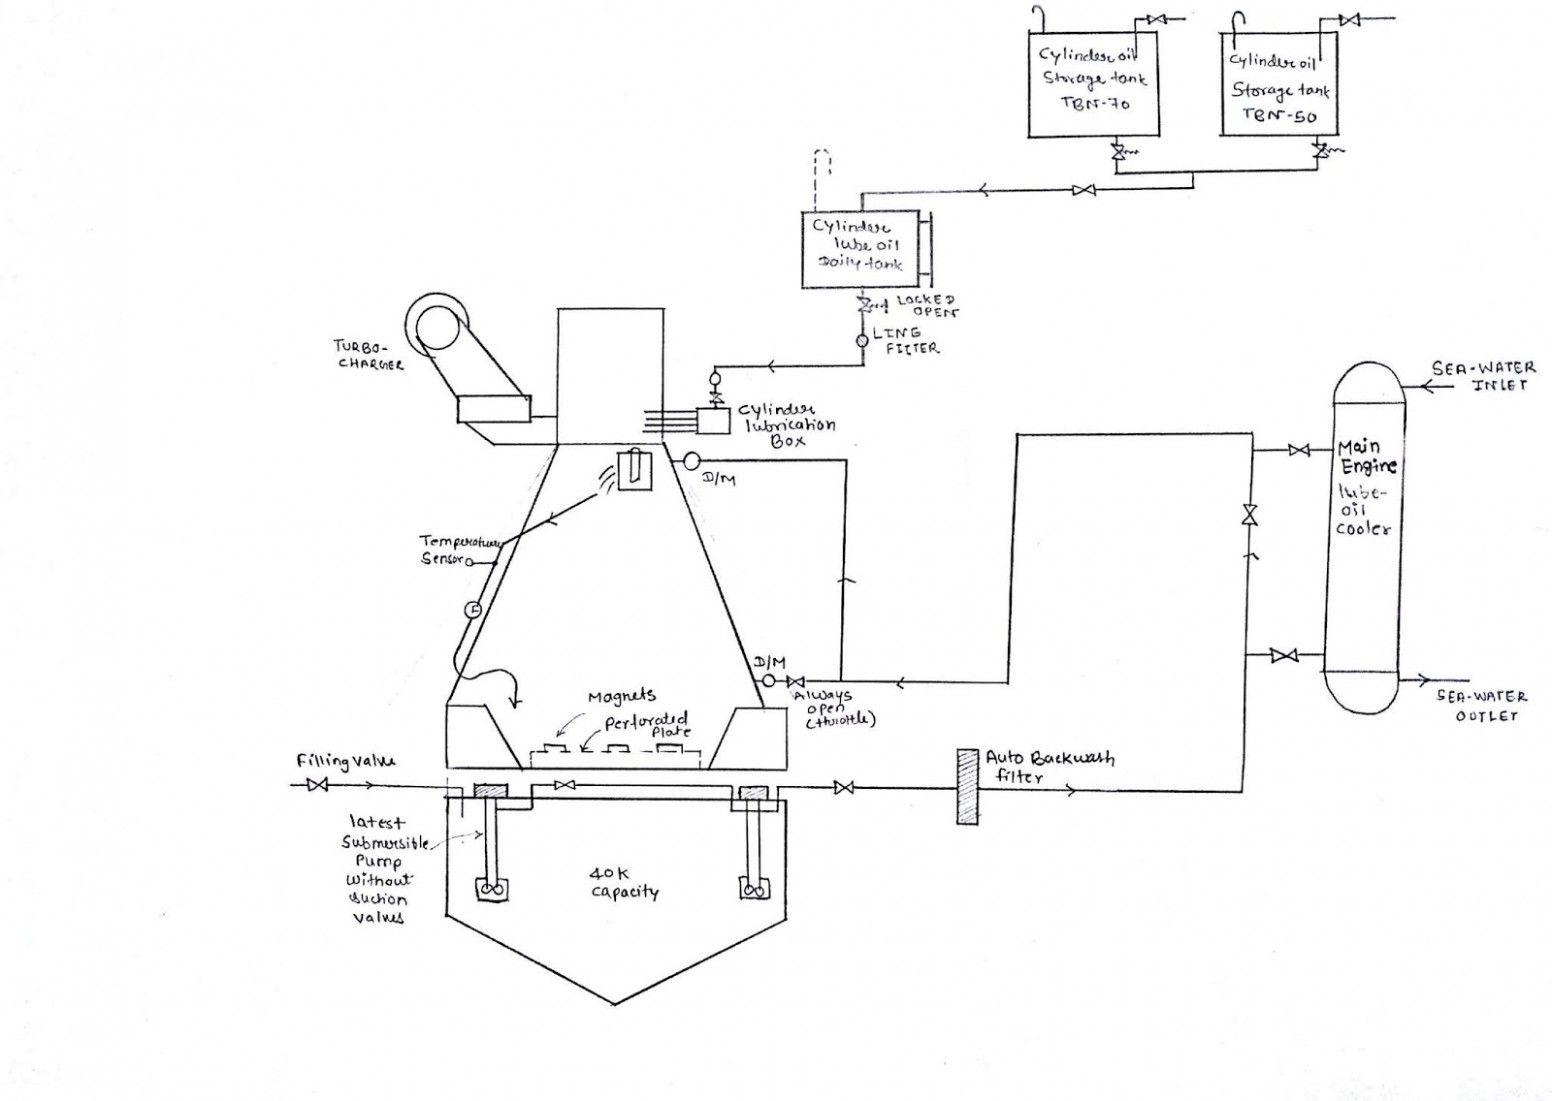 Block Diagram Of Main Engine Control System Di